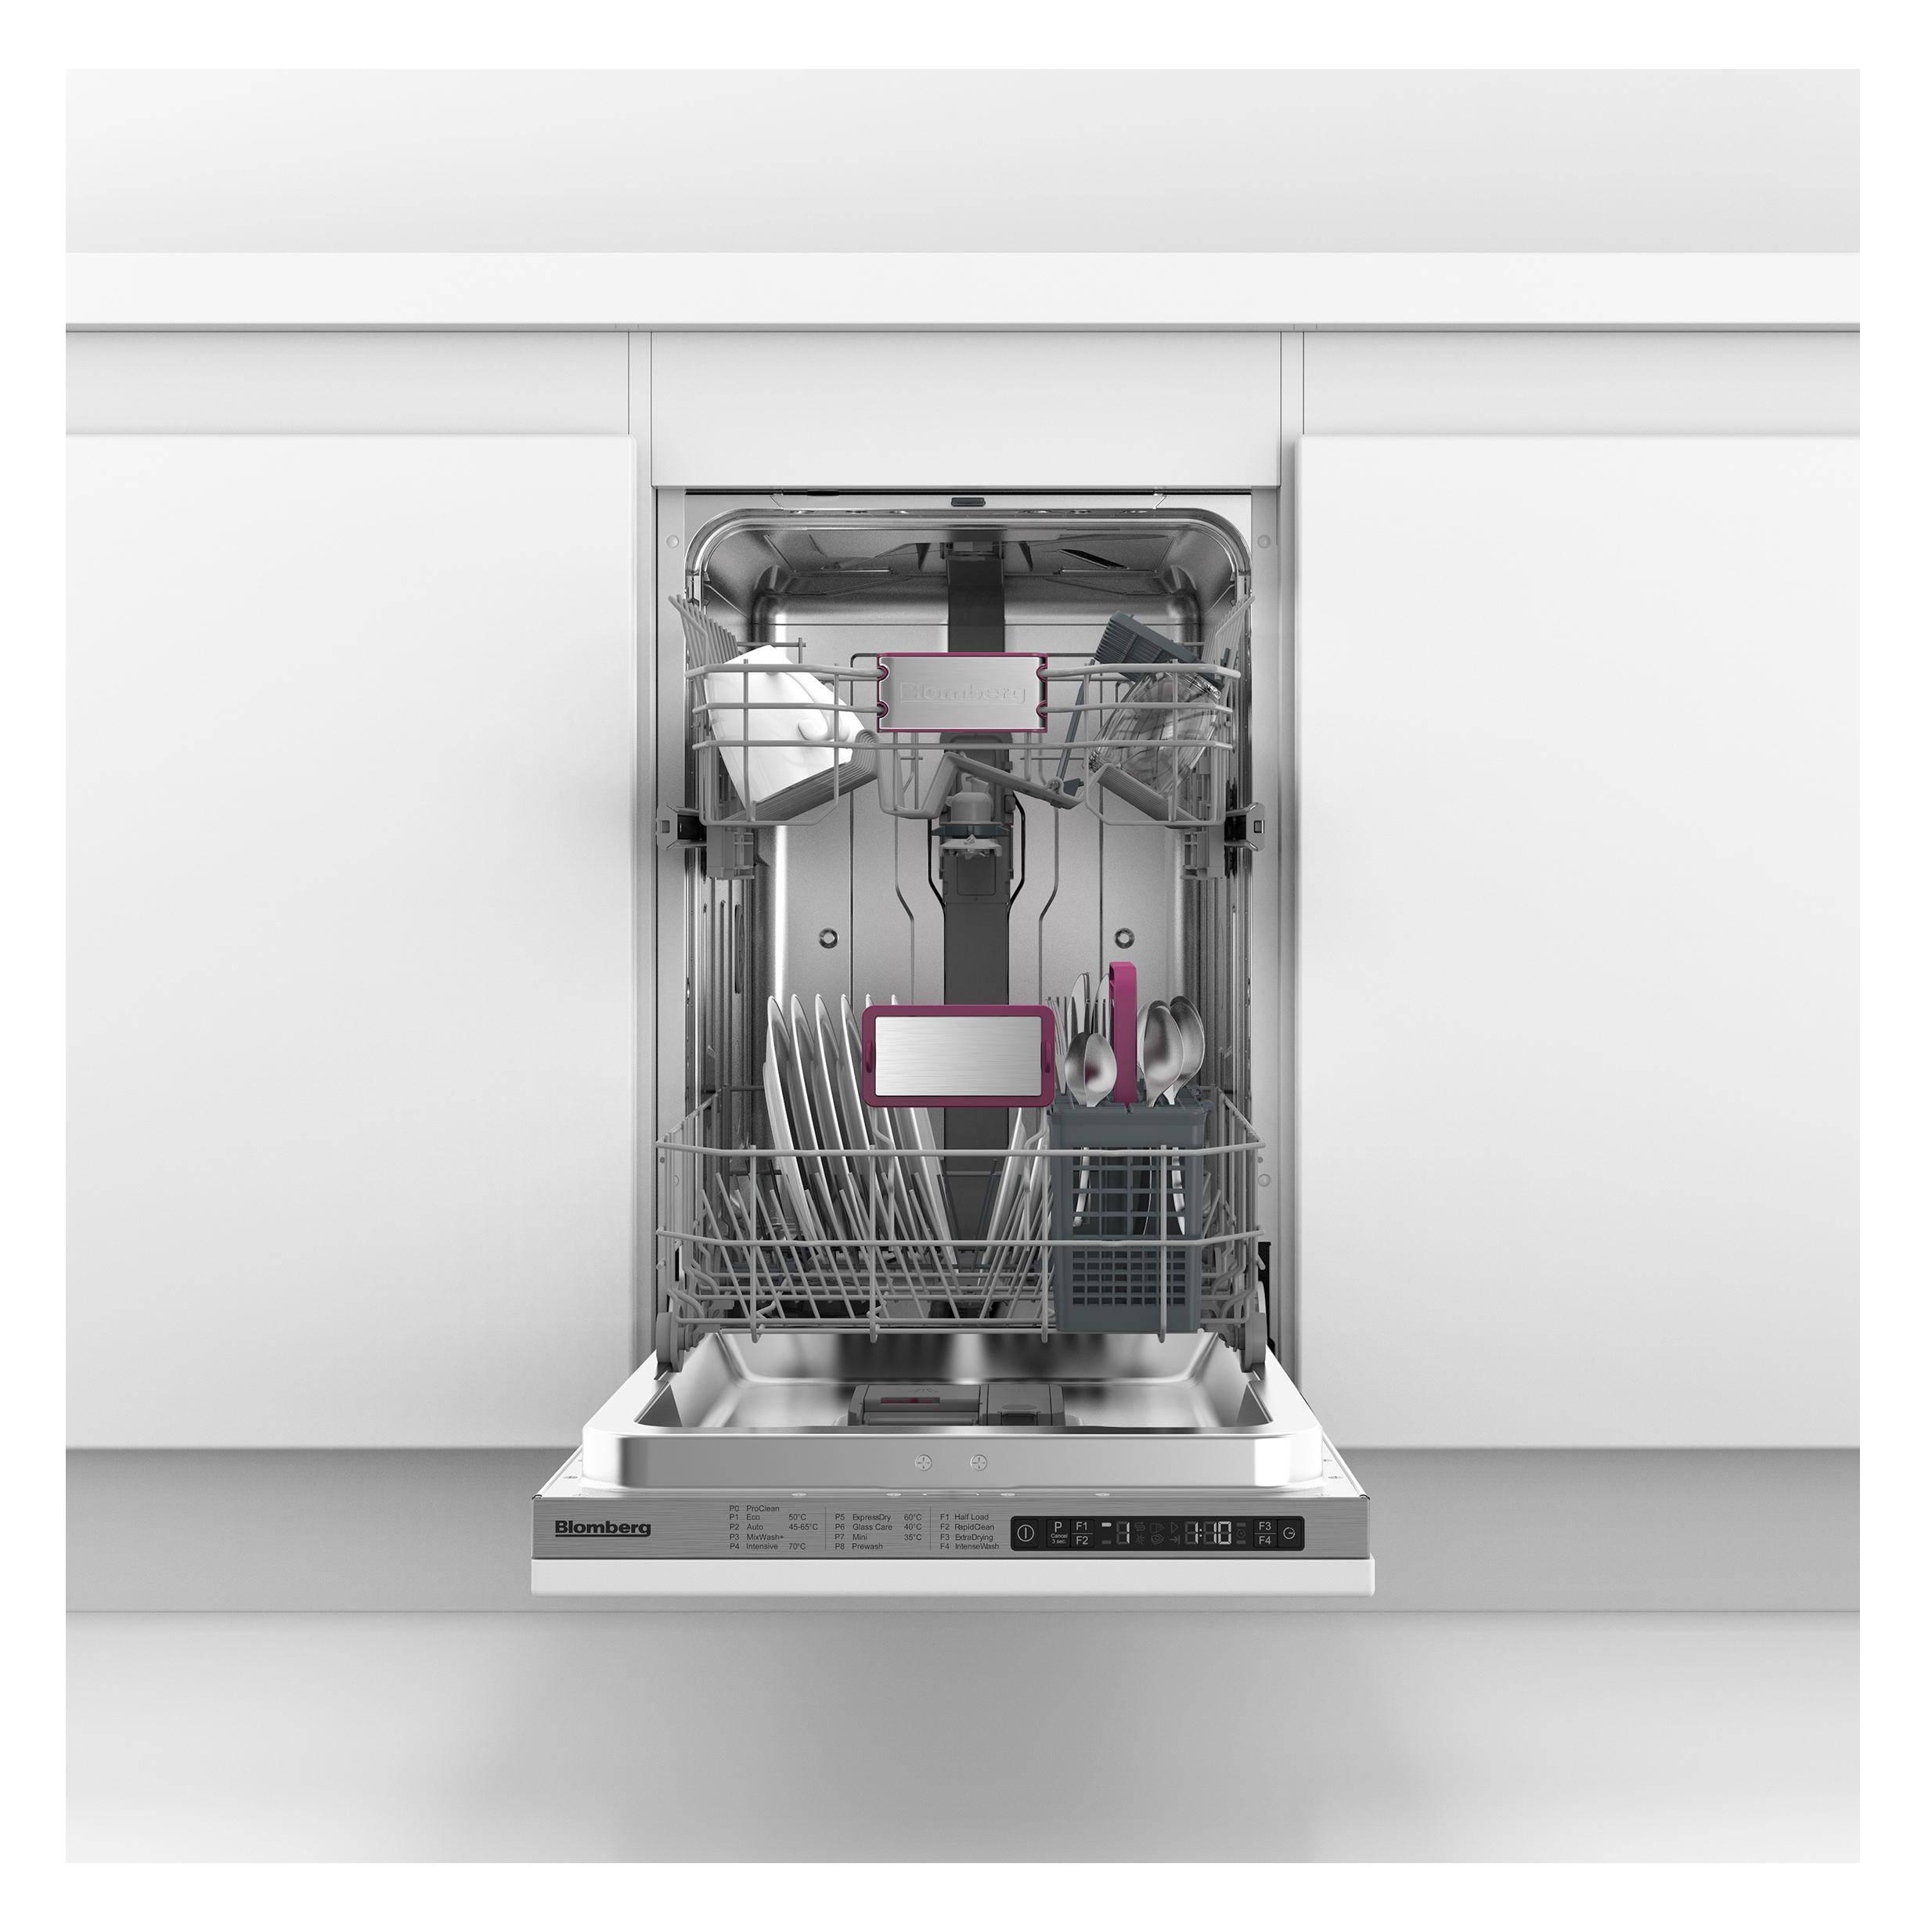 Blomberg LDV02284 Integrated slimline dishwasher